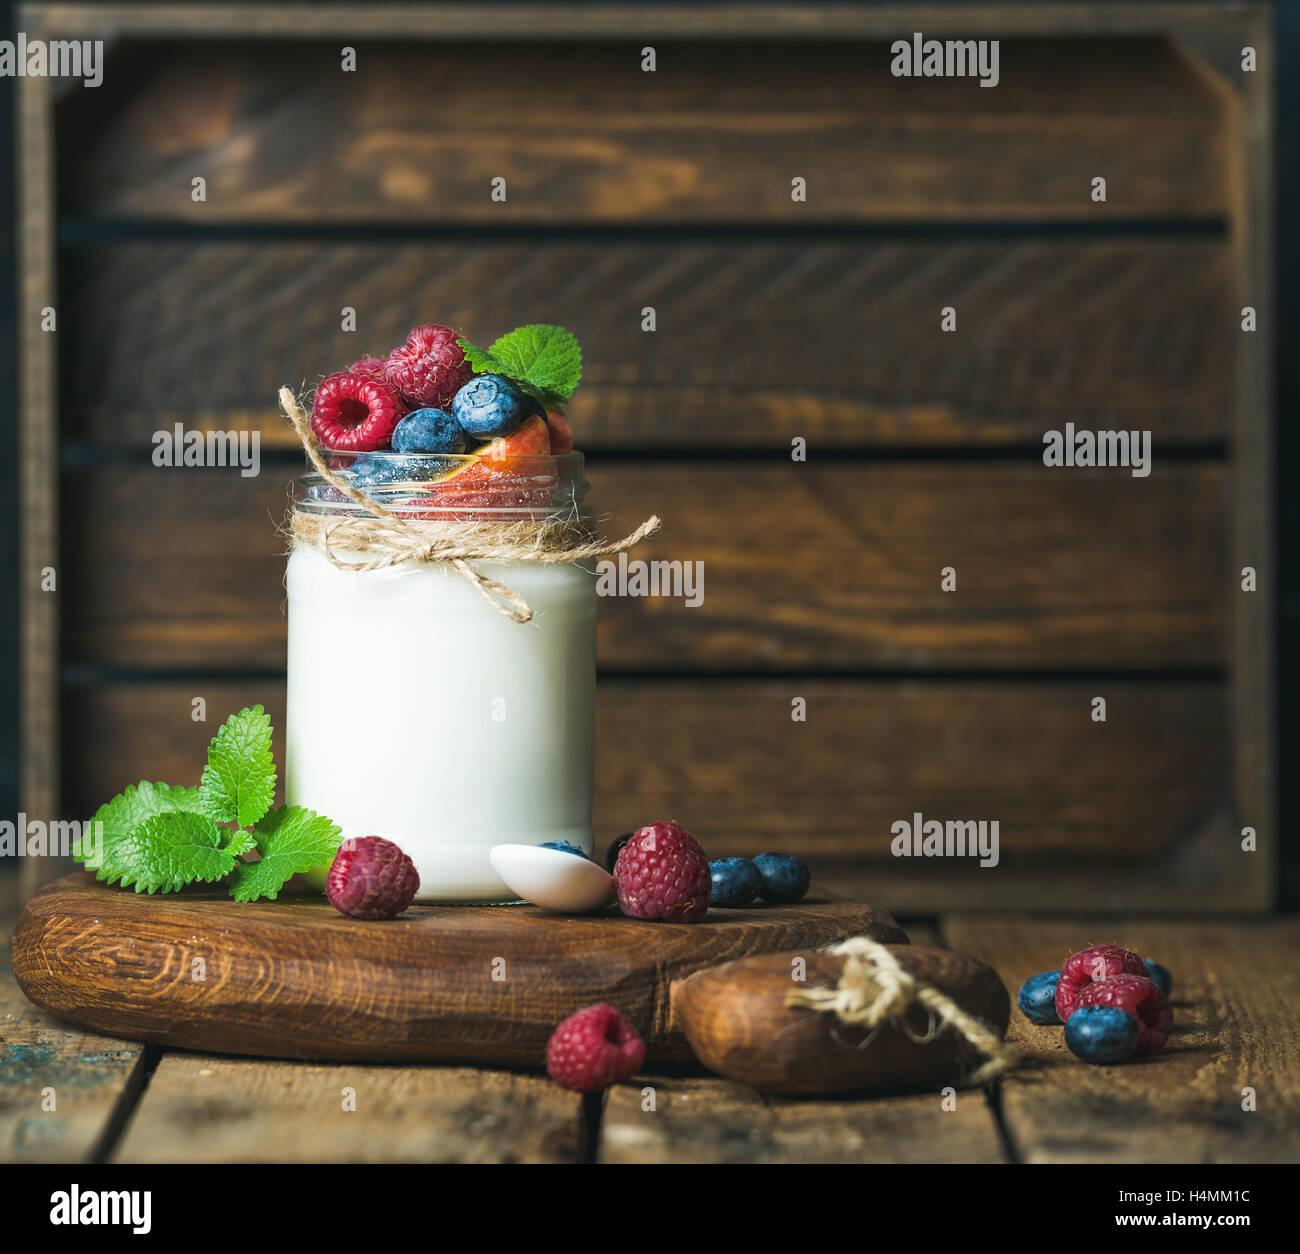 White yogurt in jar with fresh berries, peach, mint leaves - Stock Image